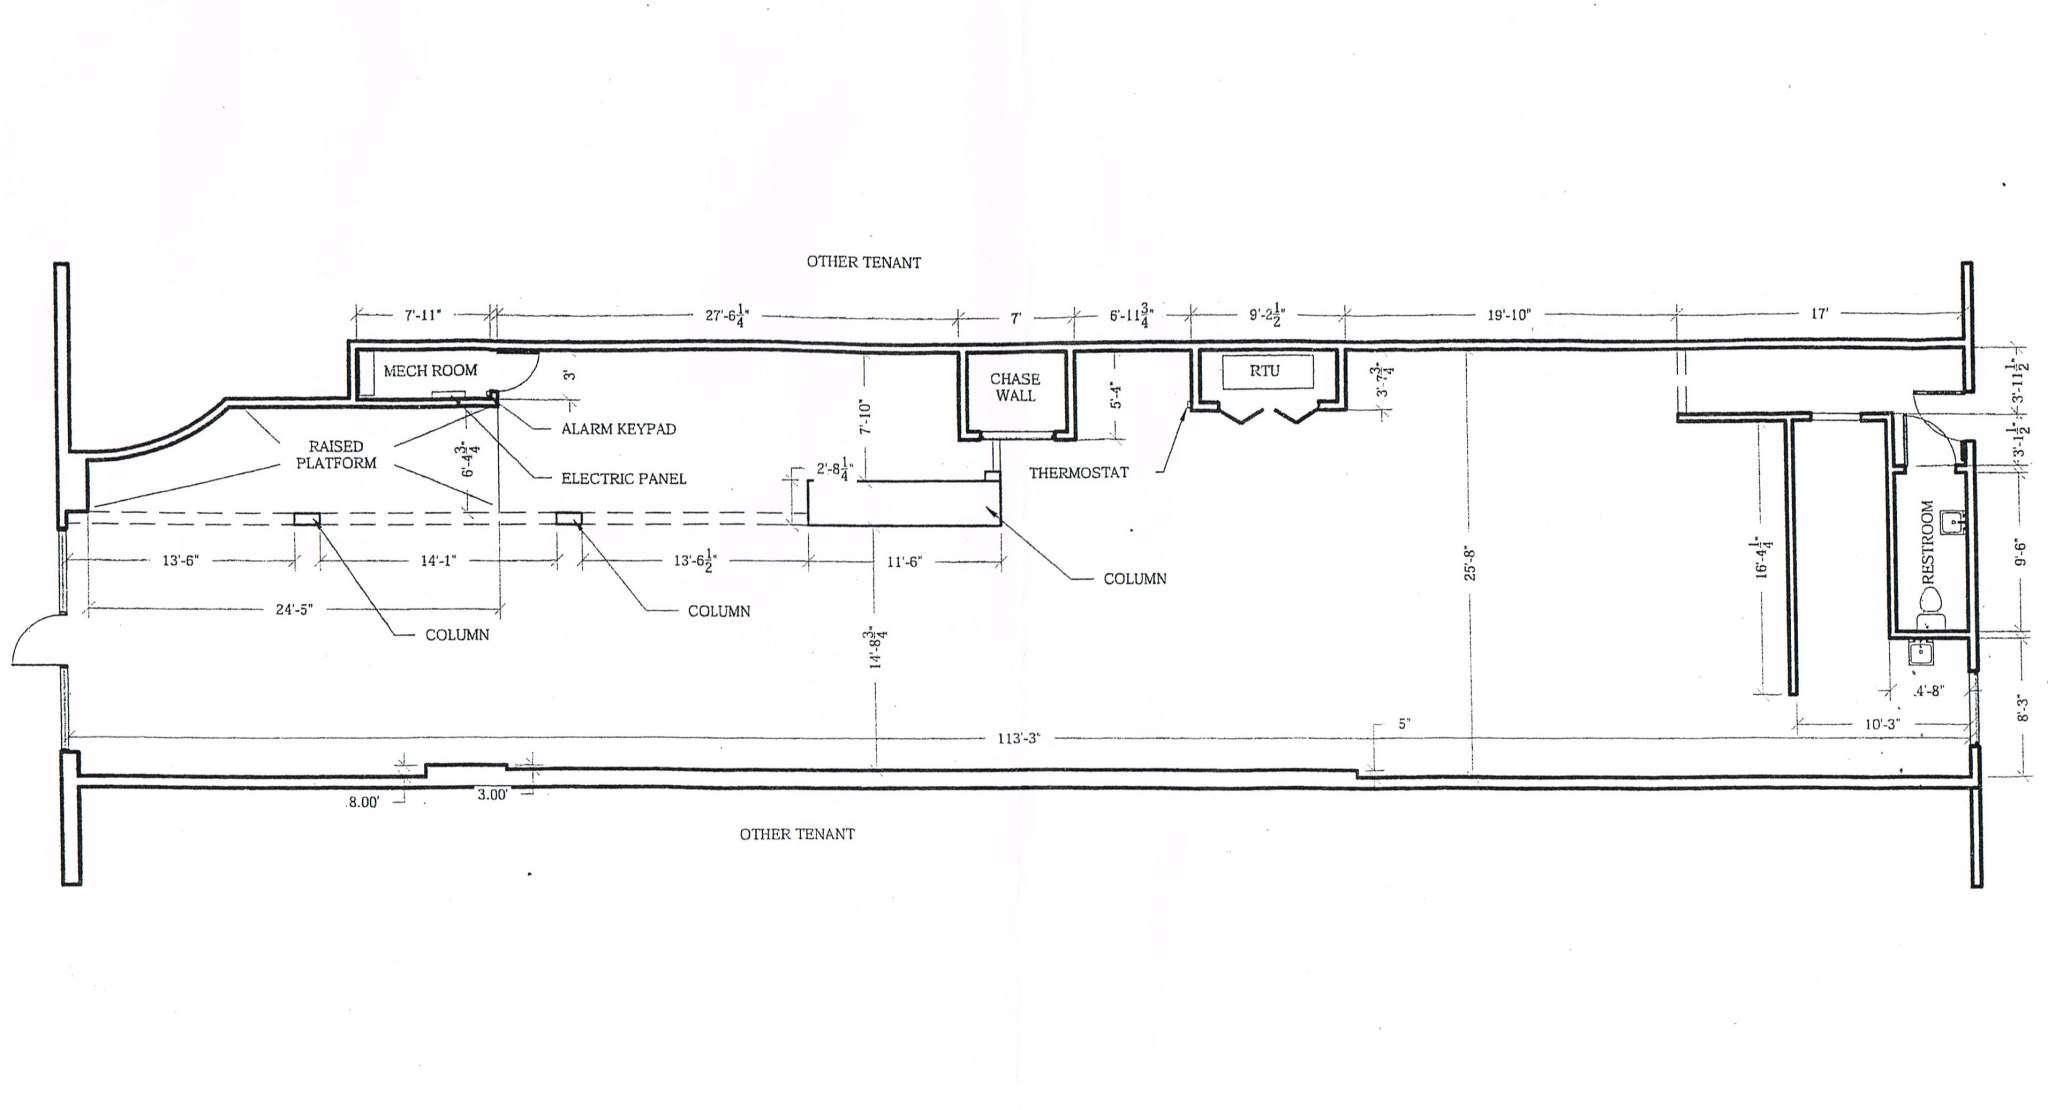 floorplan-original-scan